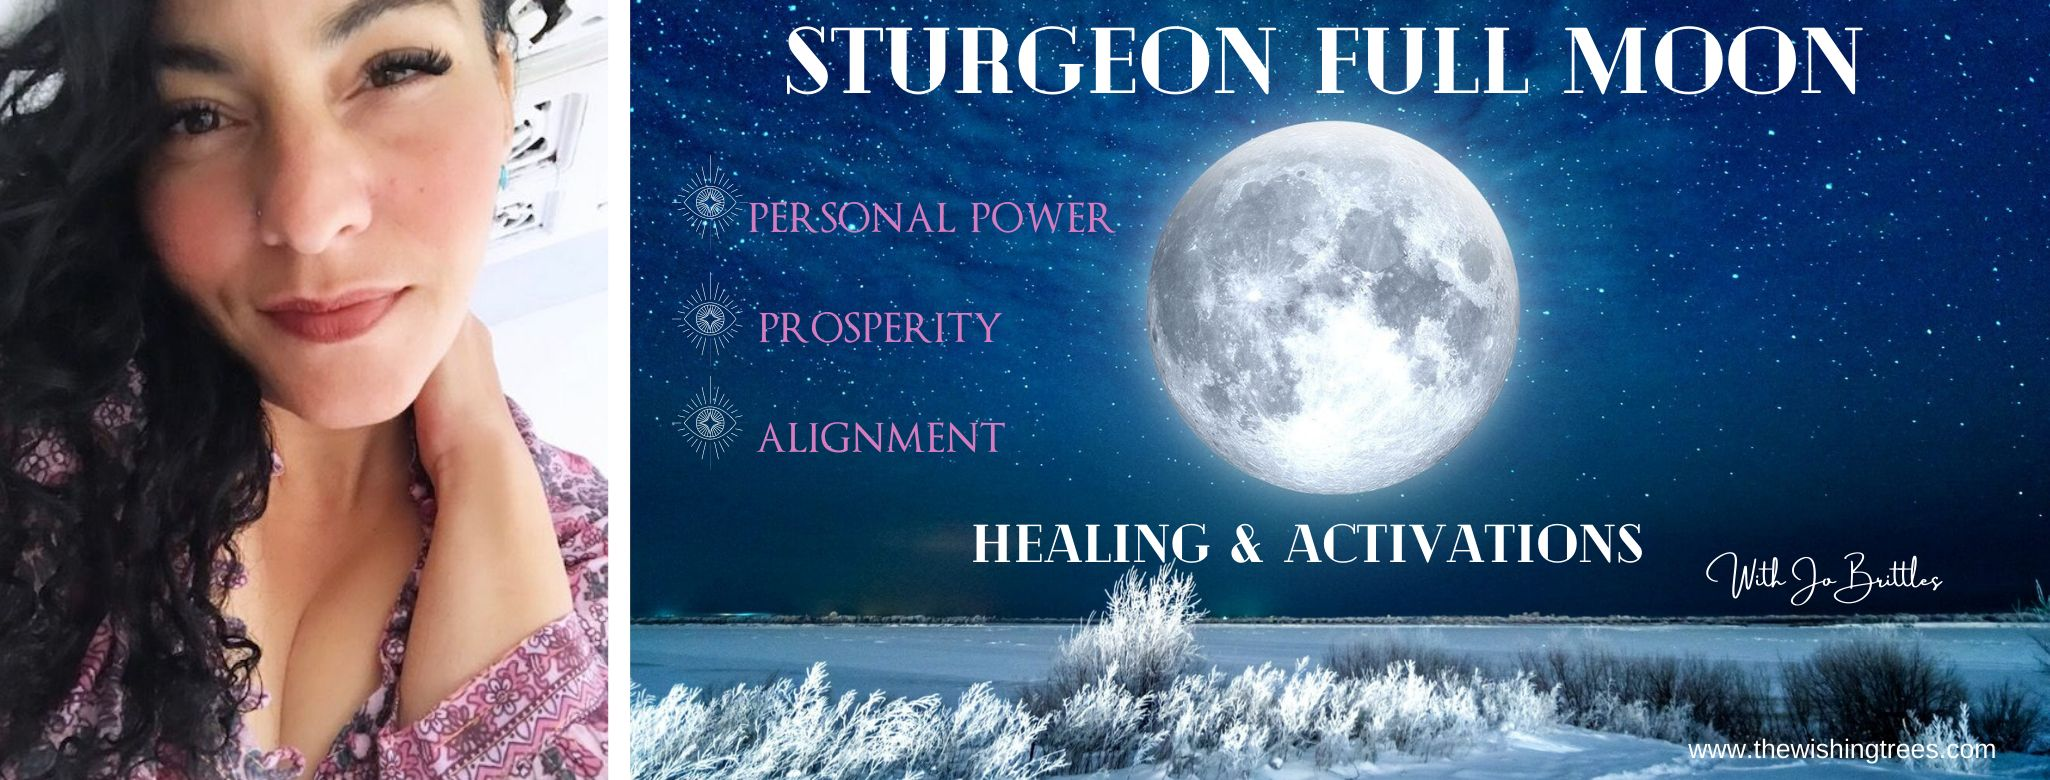 sturgeon-full-moon-banner.jpg